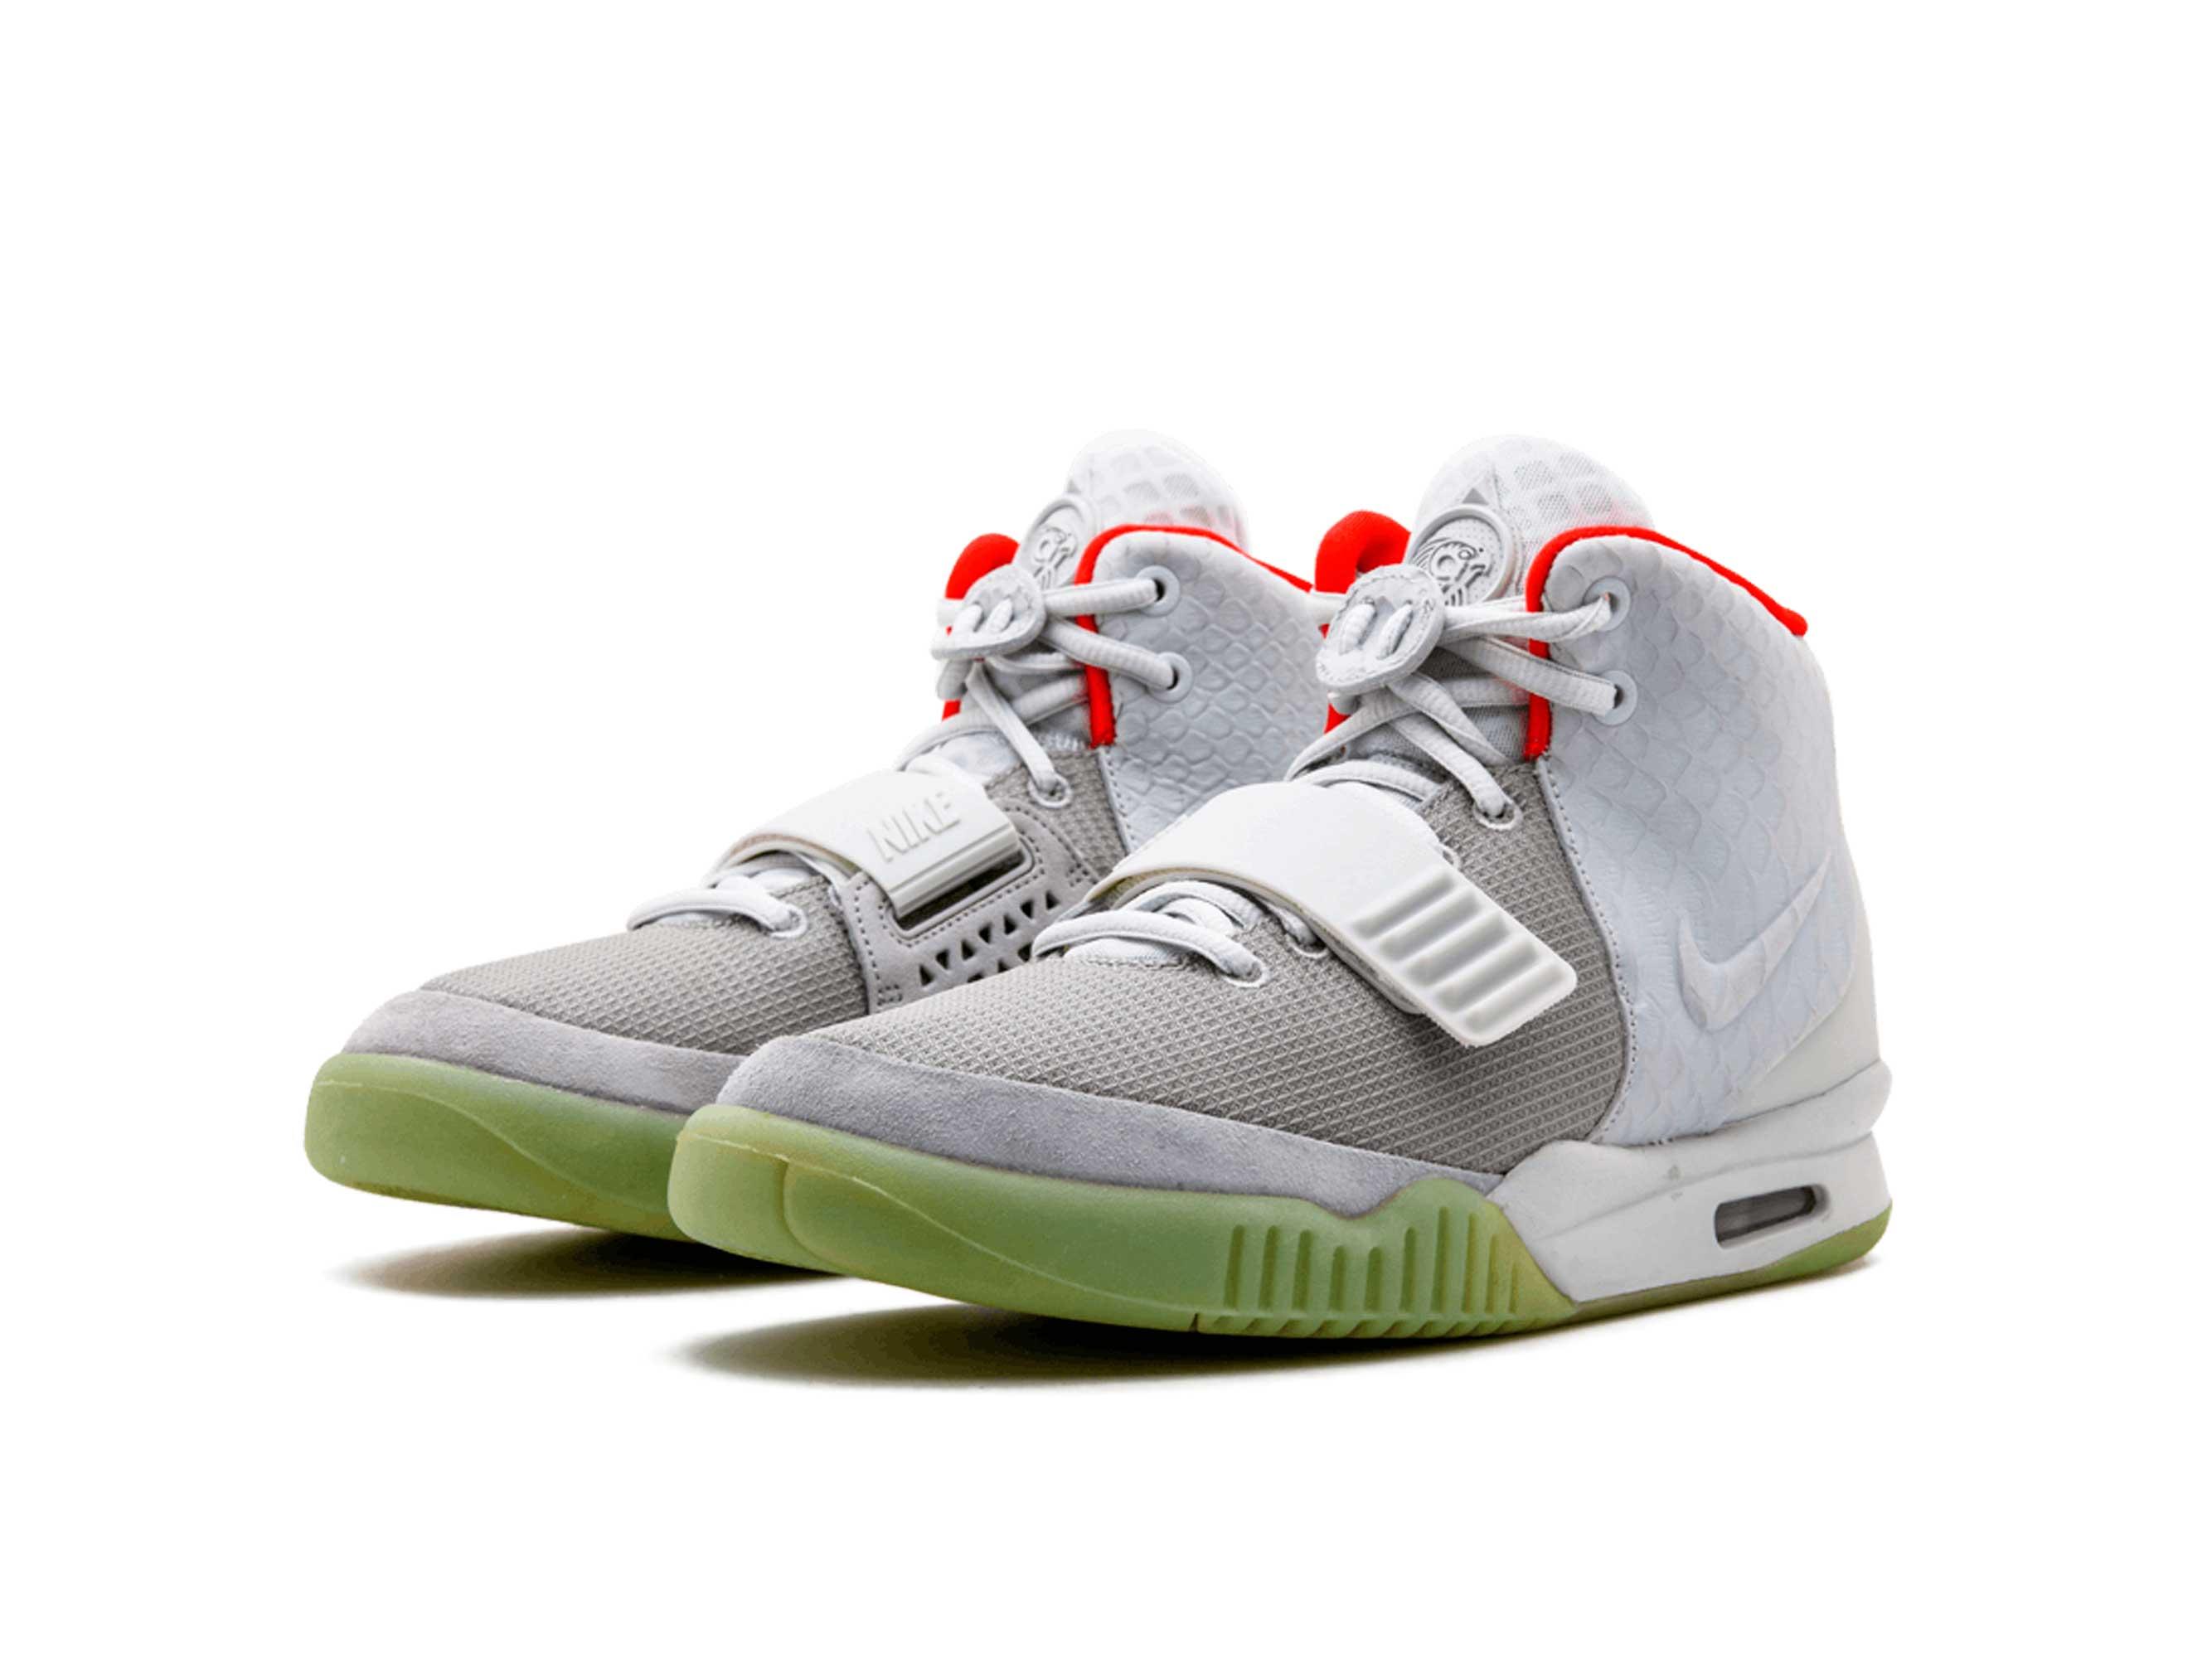 nike air yeezy 2 nrg wolf grey ⋆ Nike